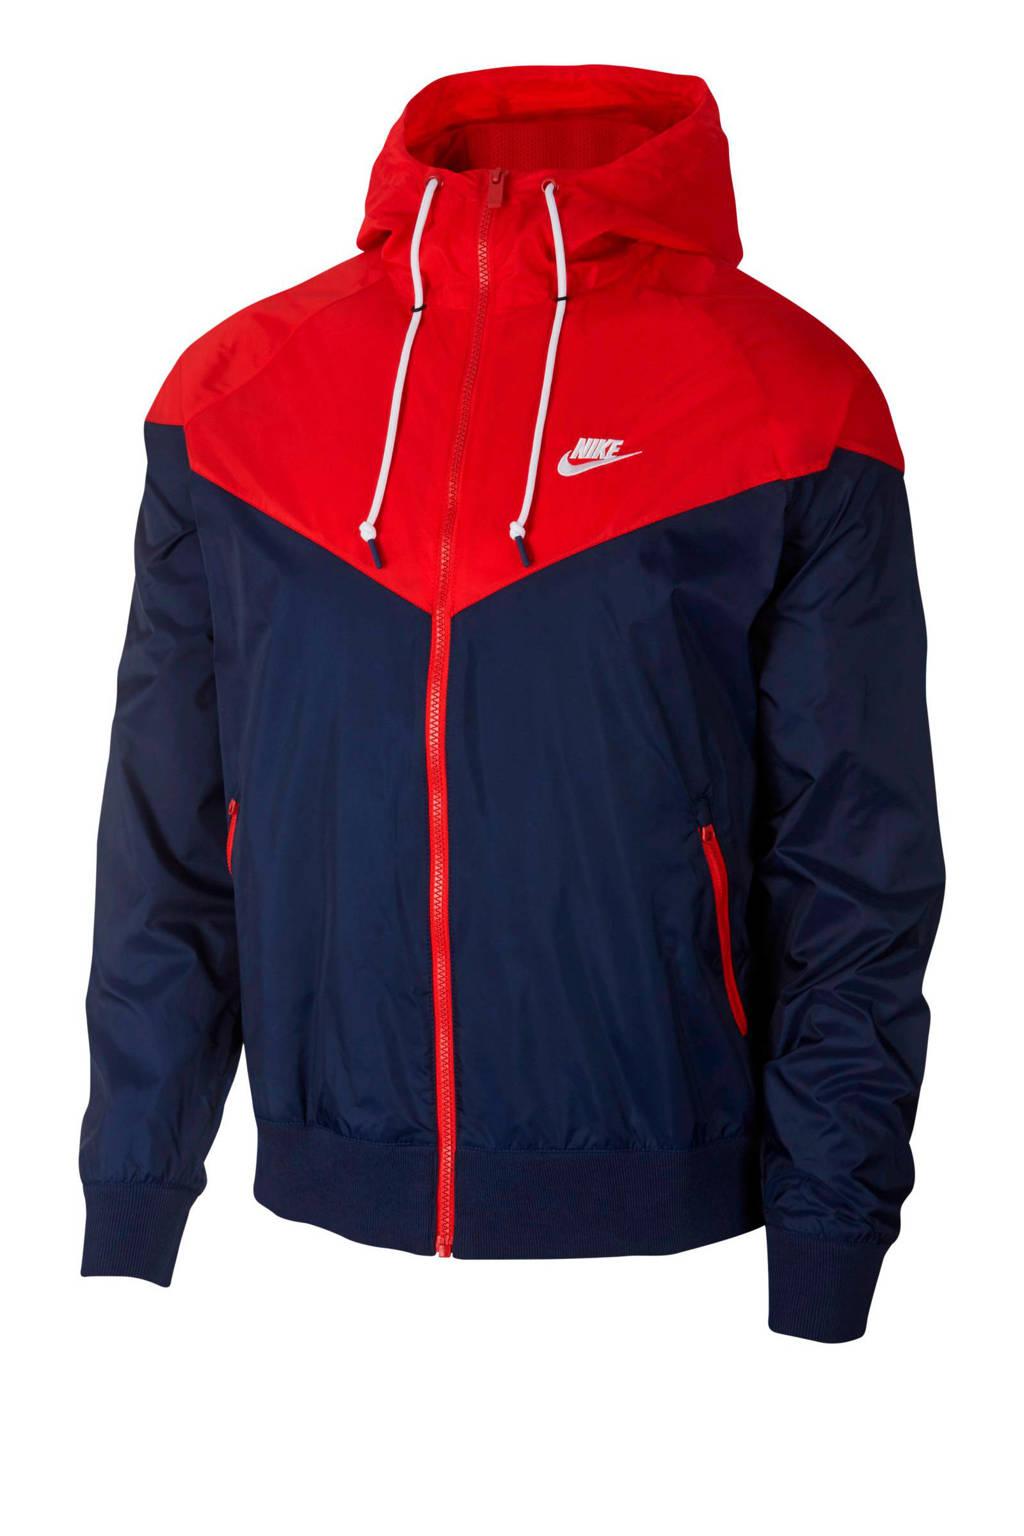 Nike jack rood/blauw, Rood/blauw